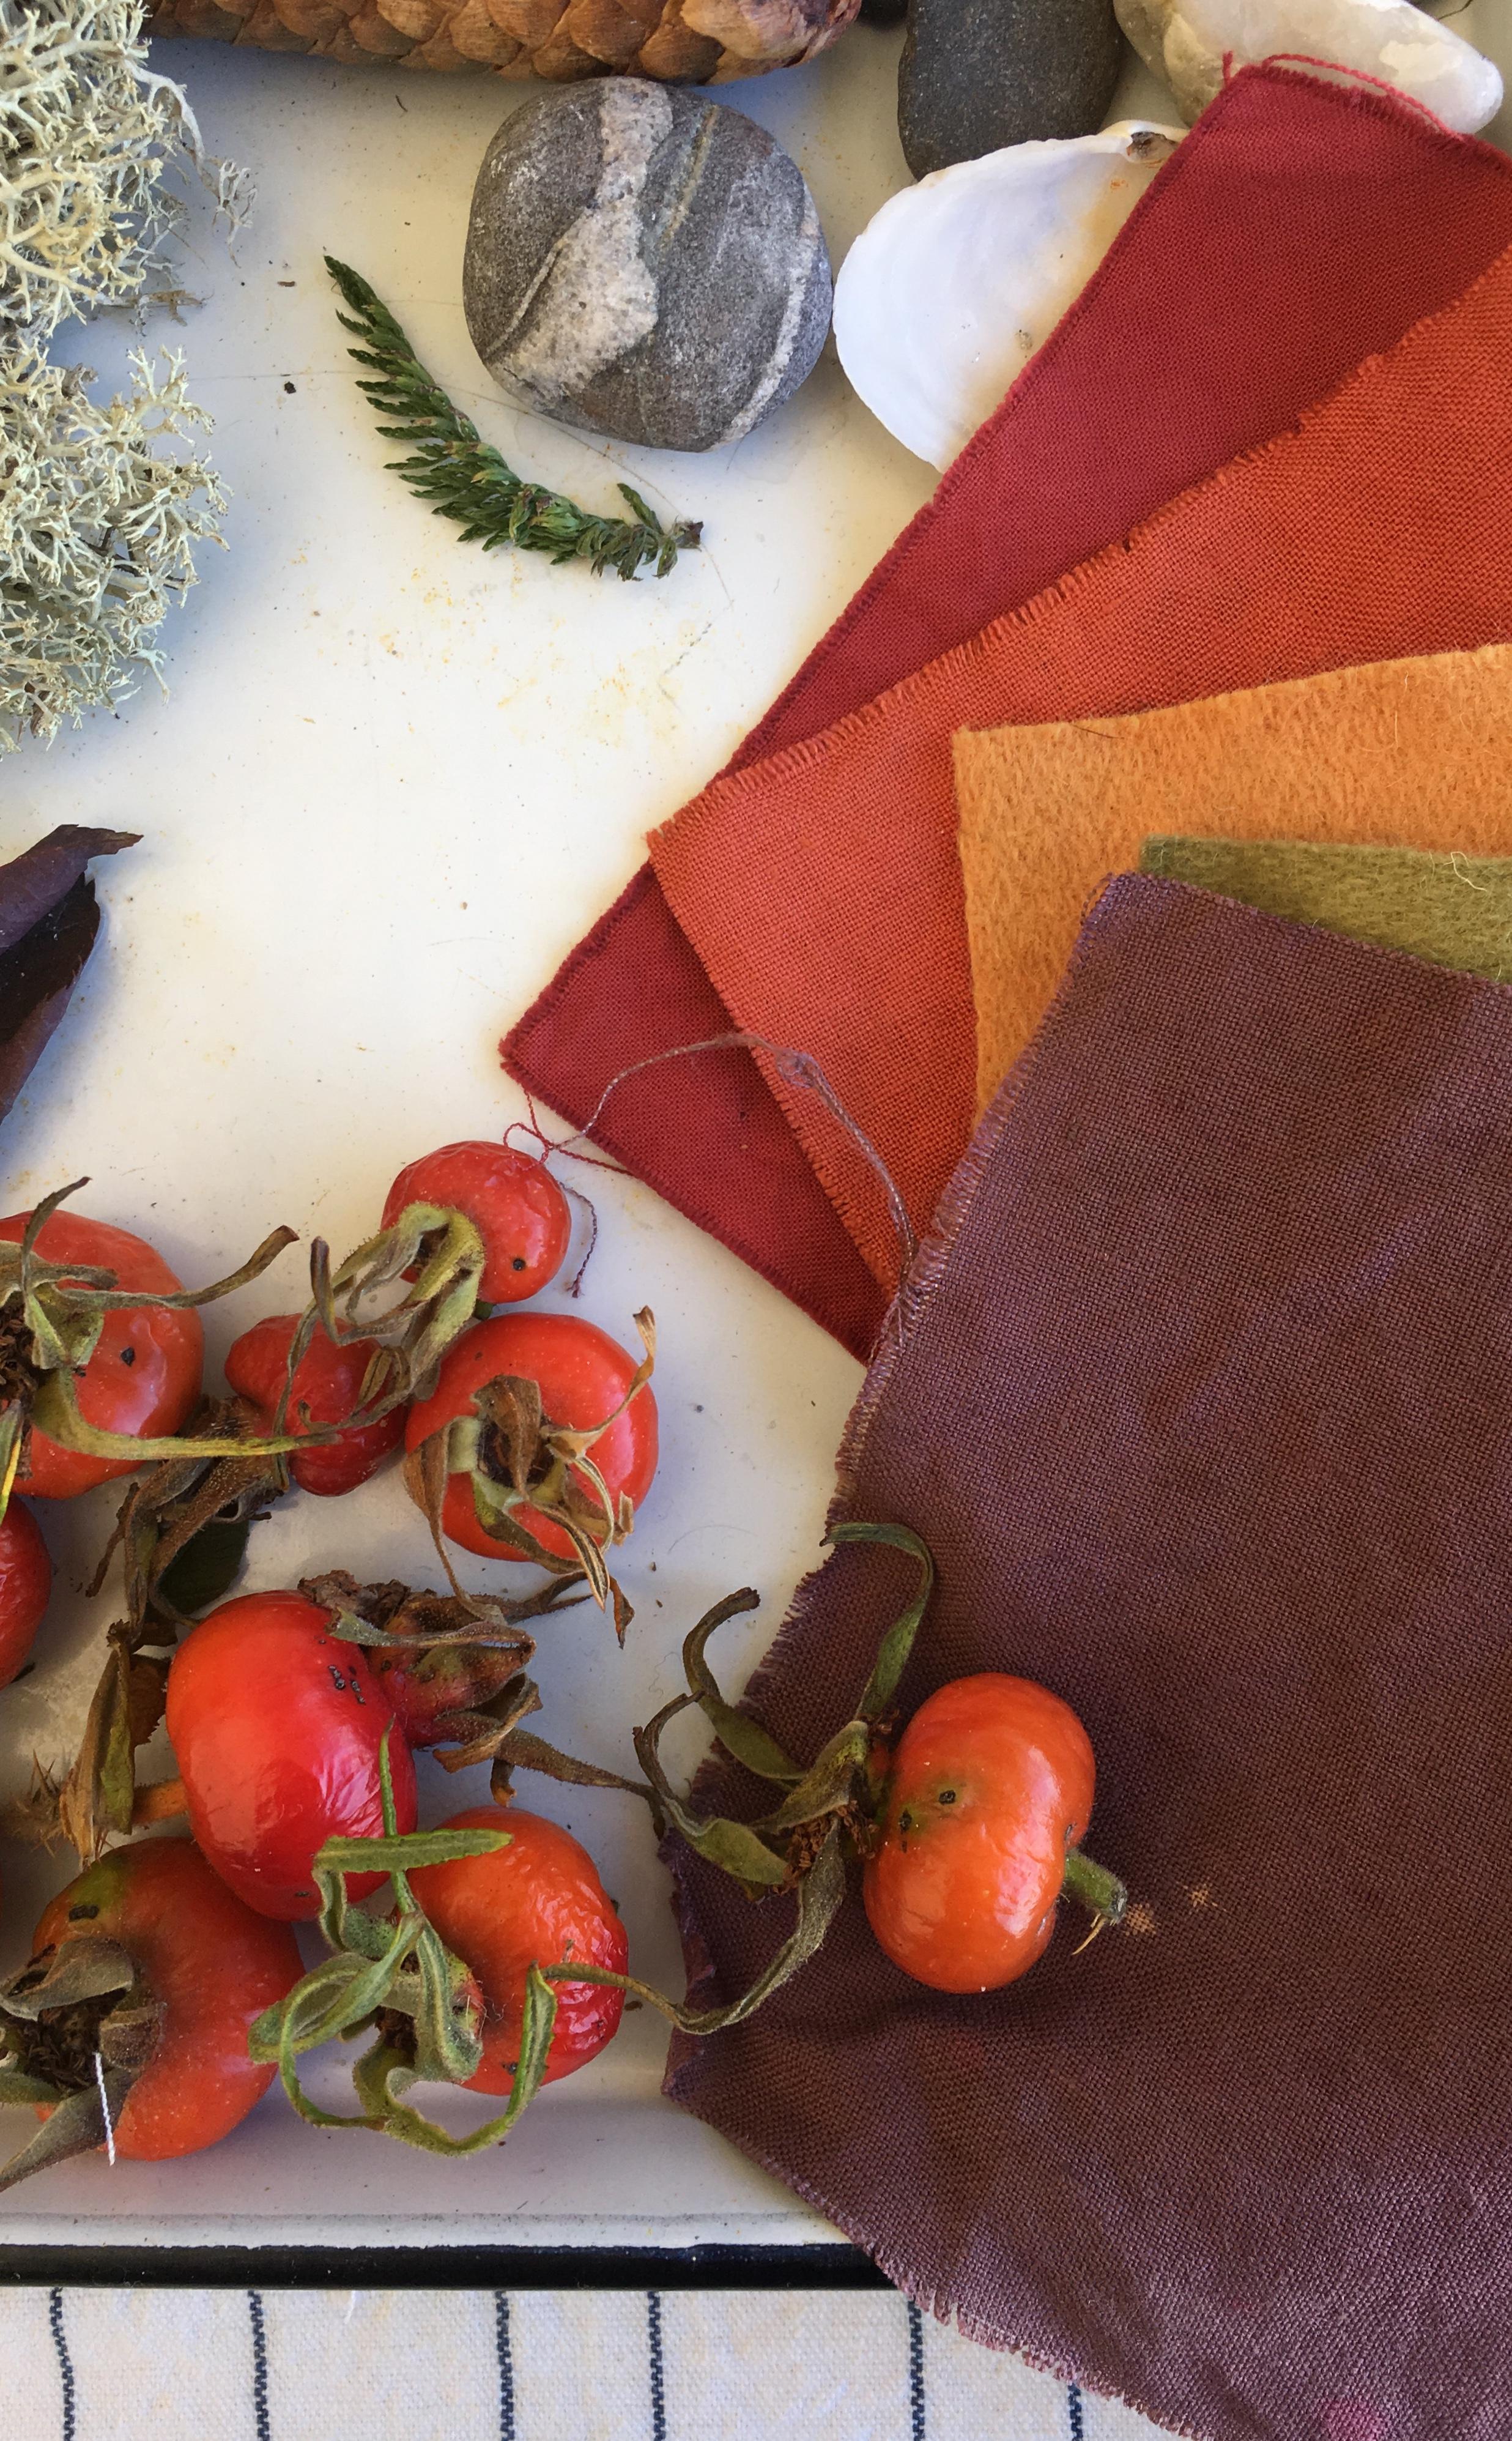 Wild rosehips, swatches in deep, vibrant tones